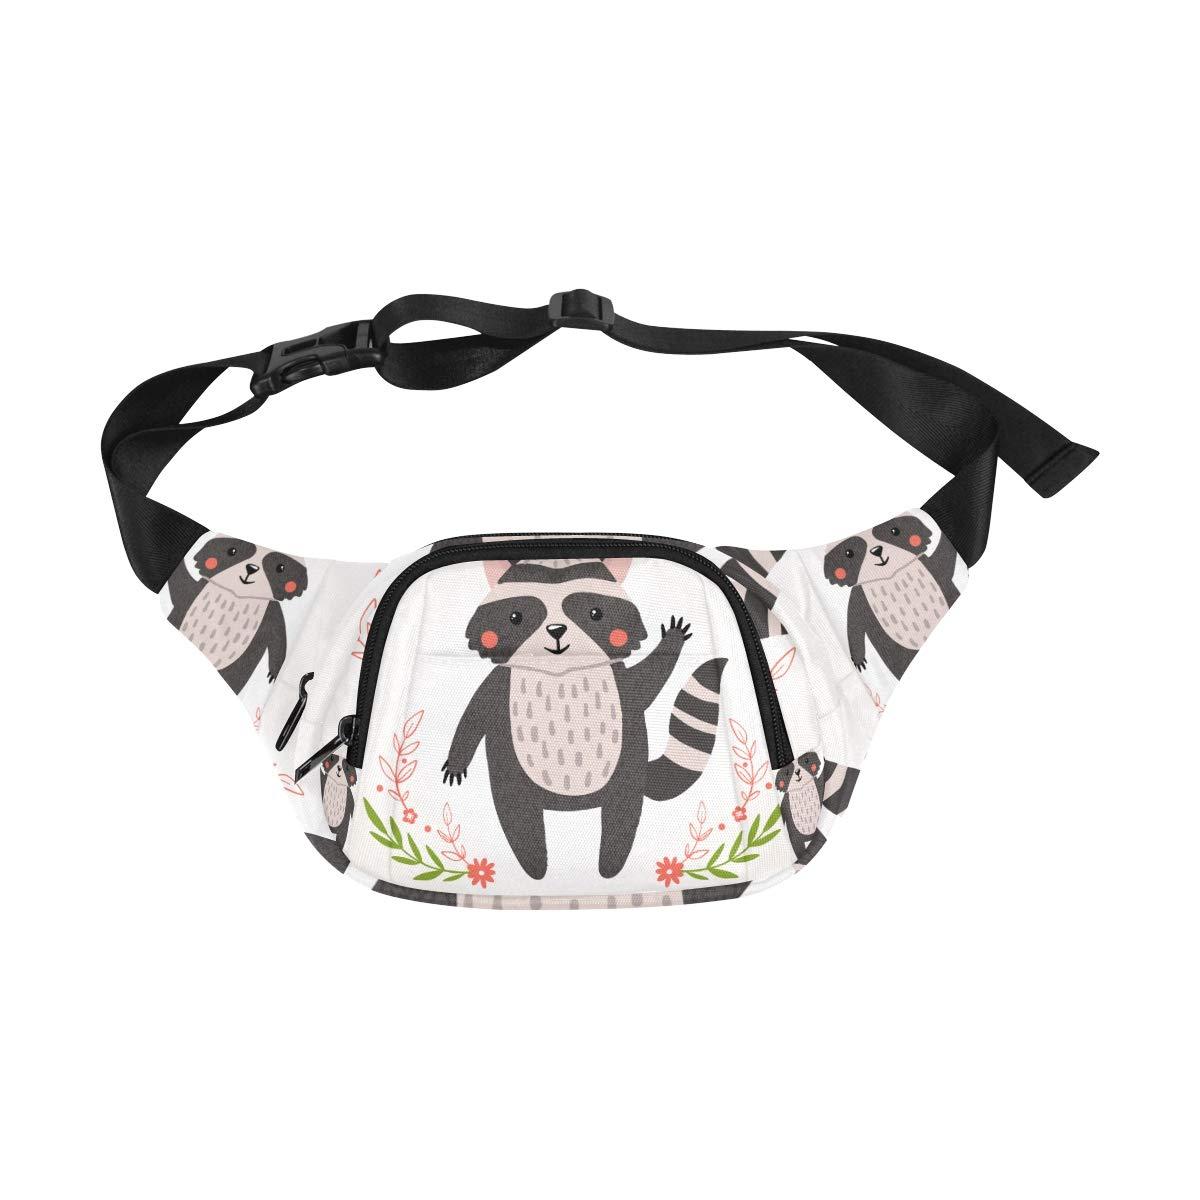 Hand Drawn Cute Lovely Raccoon Fenny Packs Waist Bags Adjustable Belt Waterproof Nylon Travel Running Sport Vacation Party For Men Women Boys Girls Kids